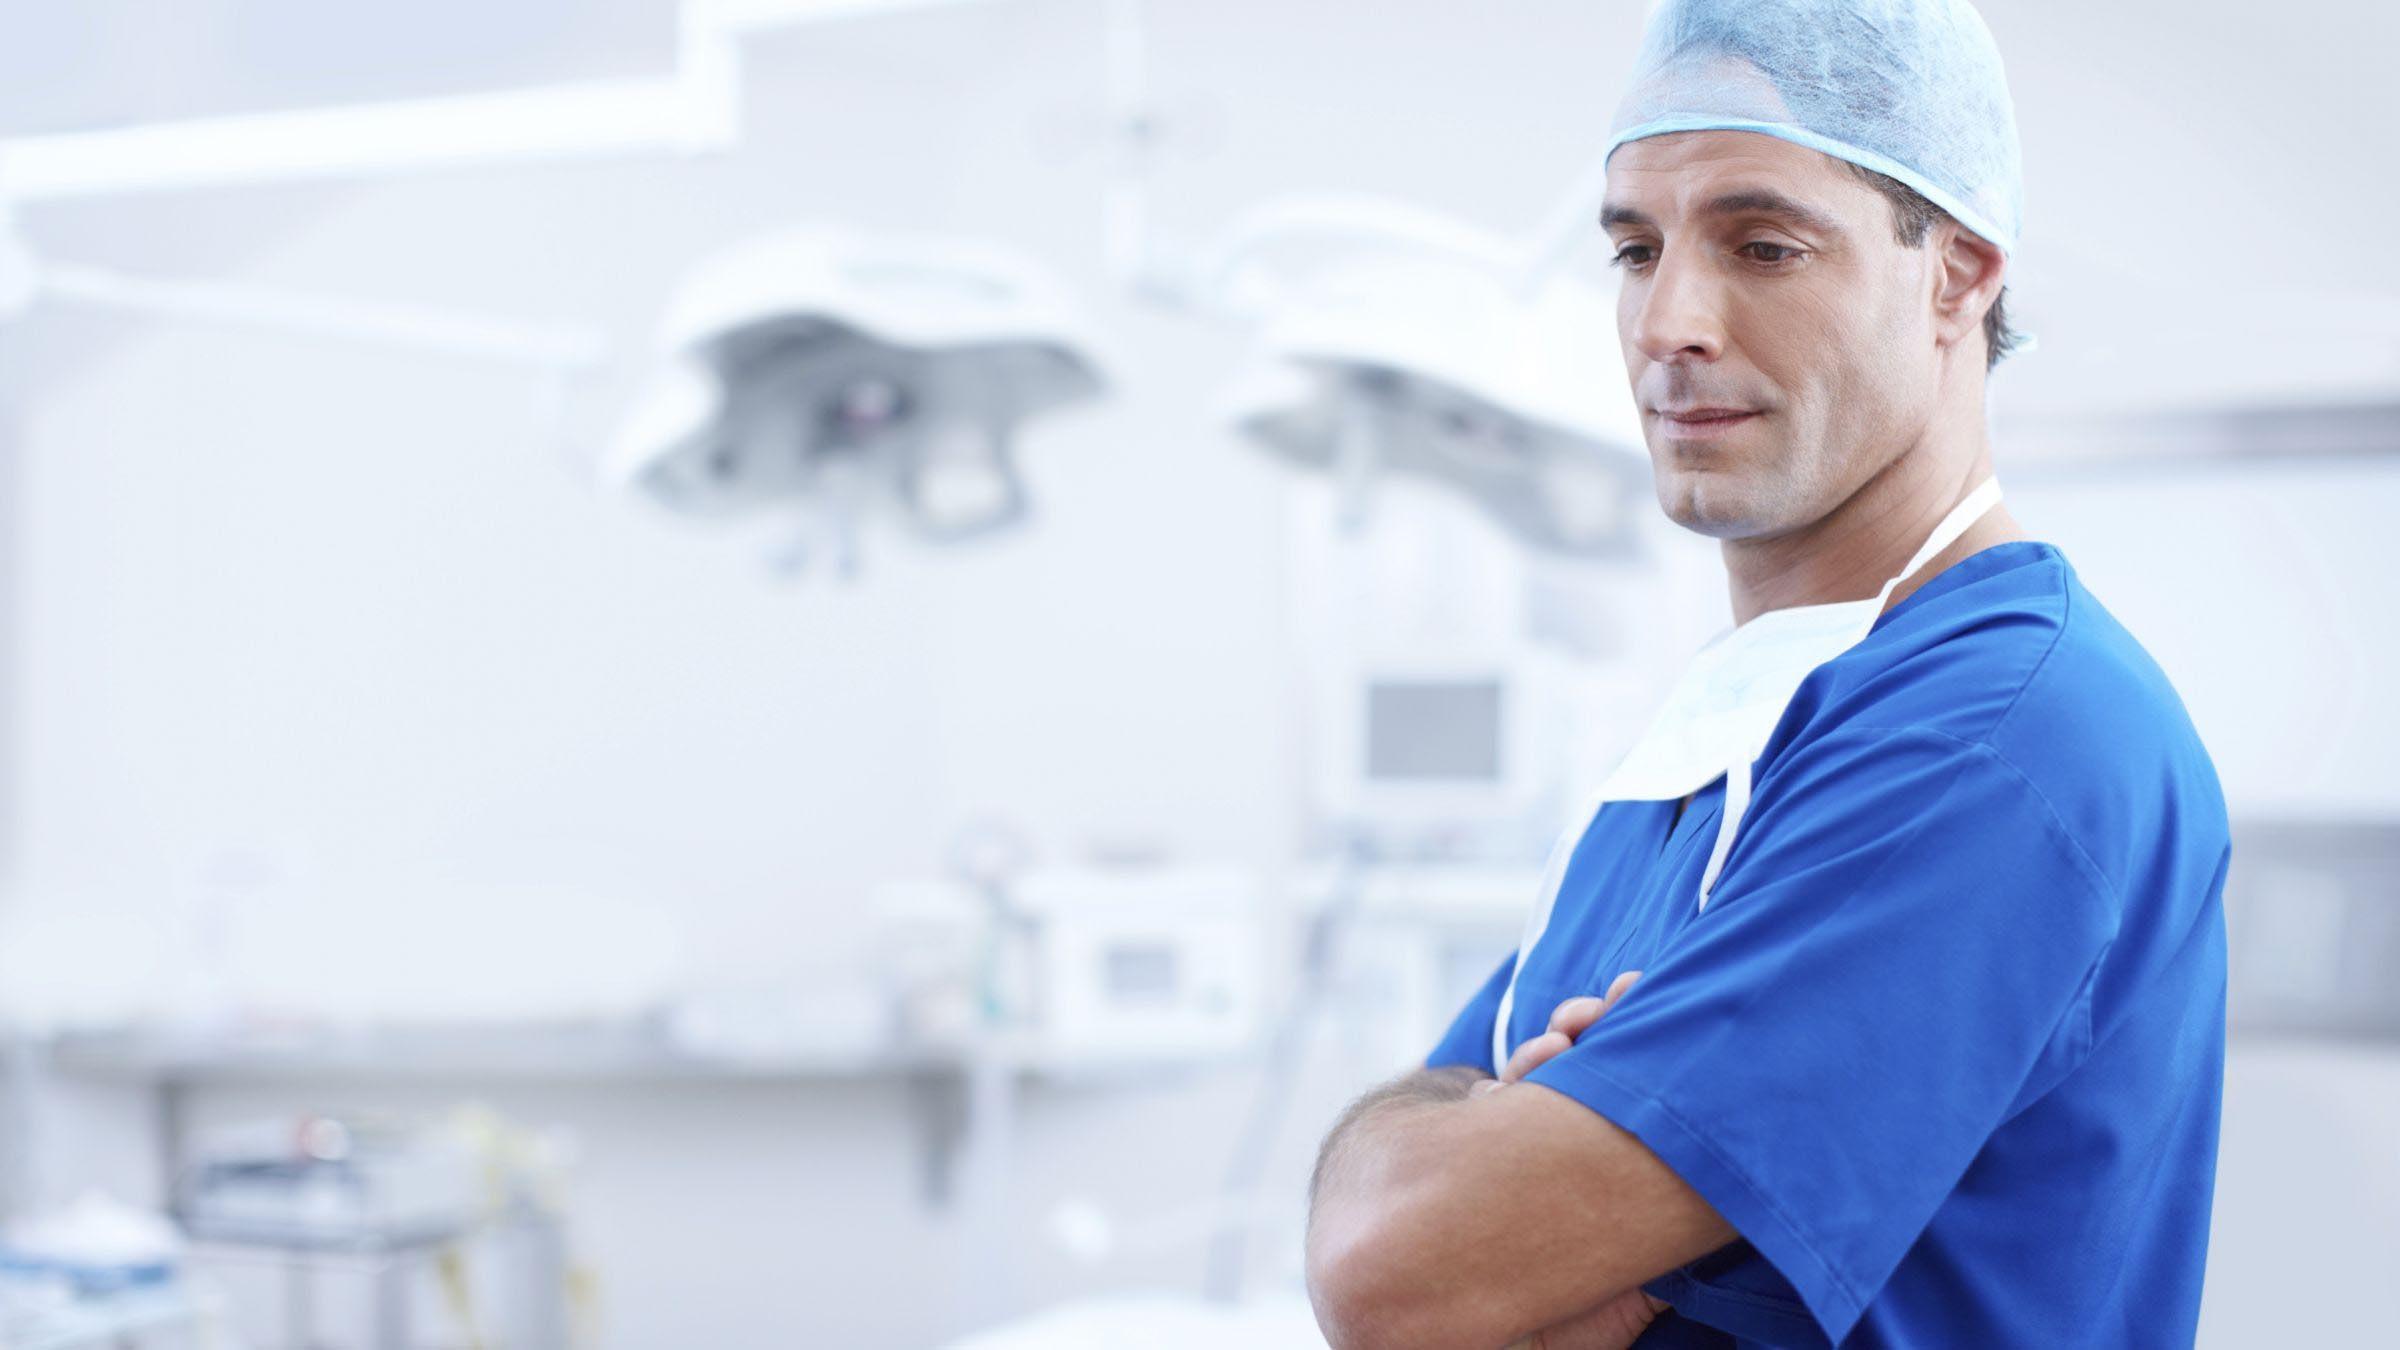 Physician, heal thyself (Blog)